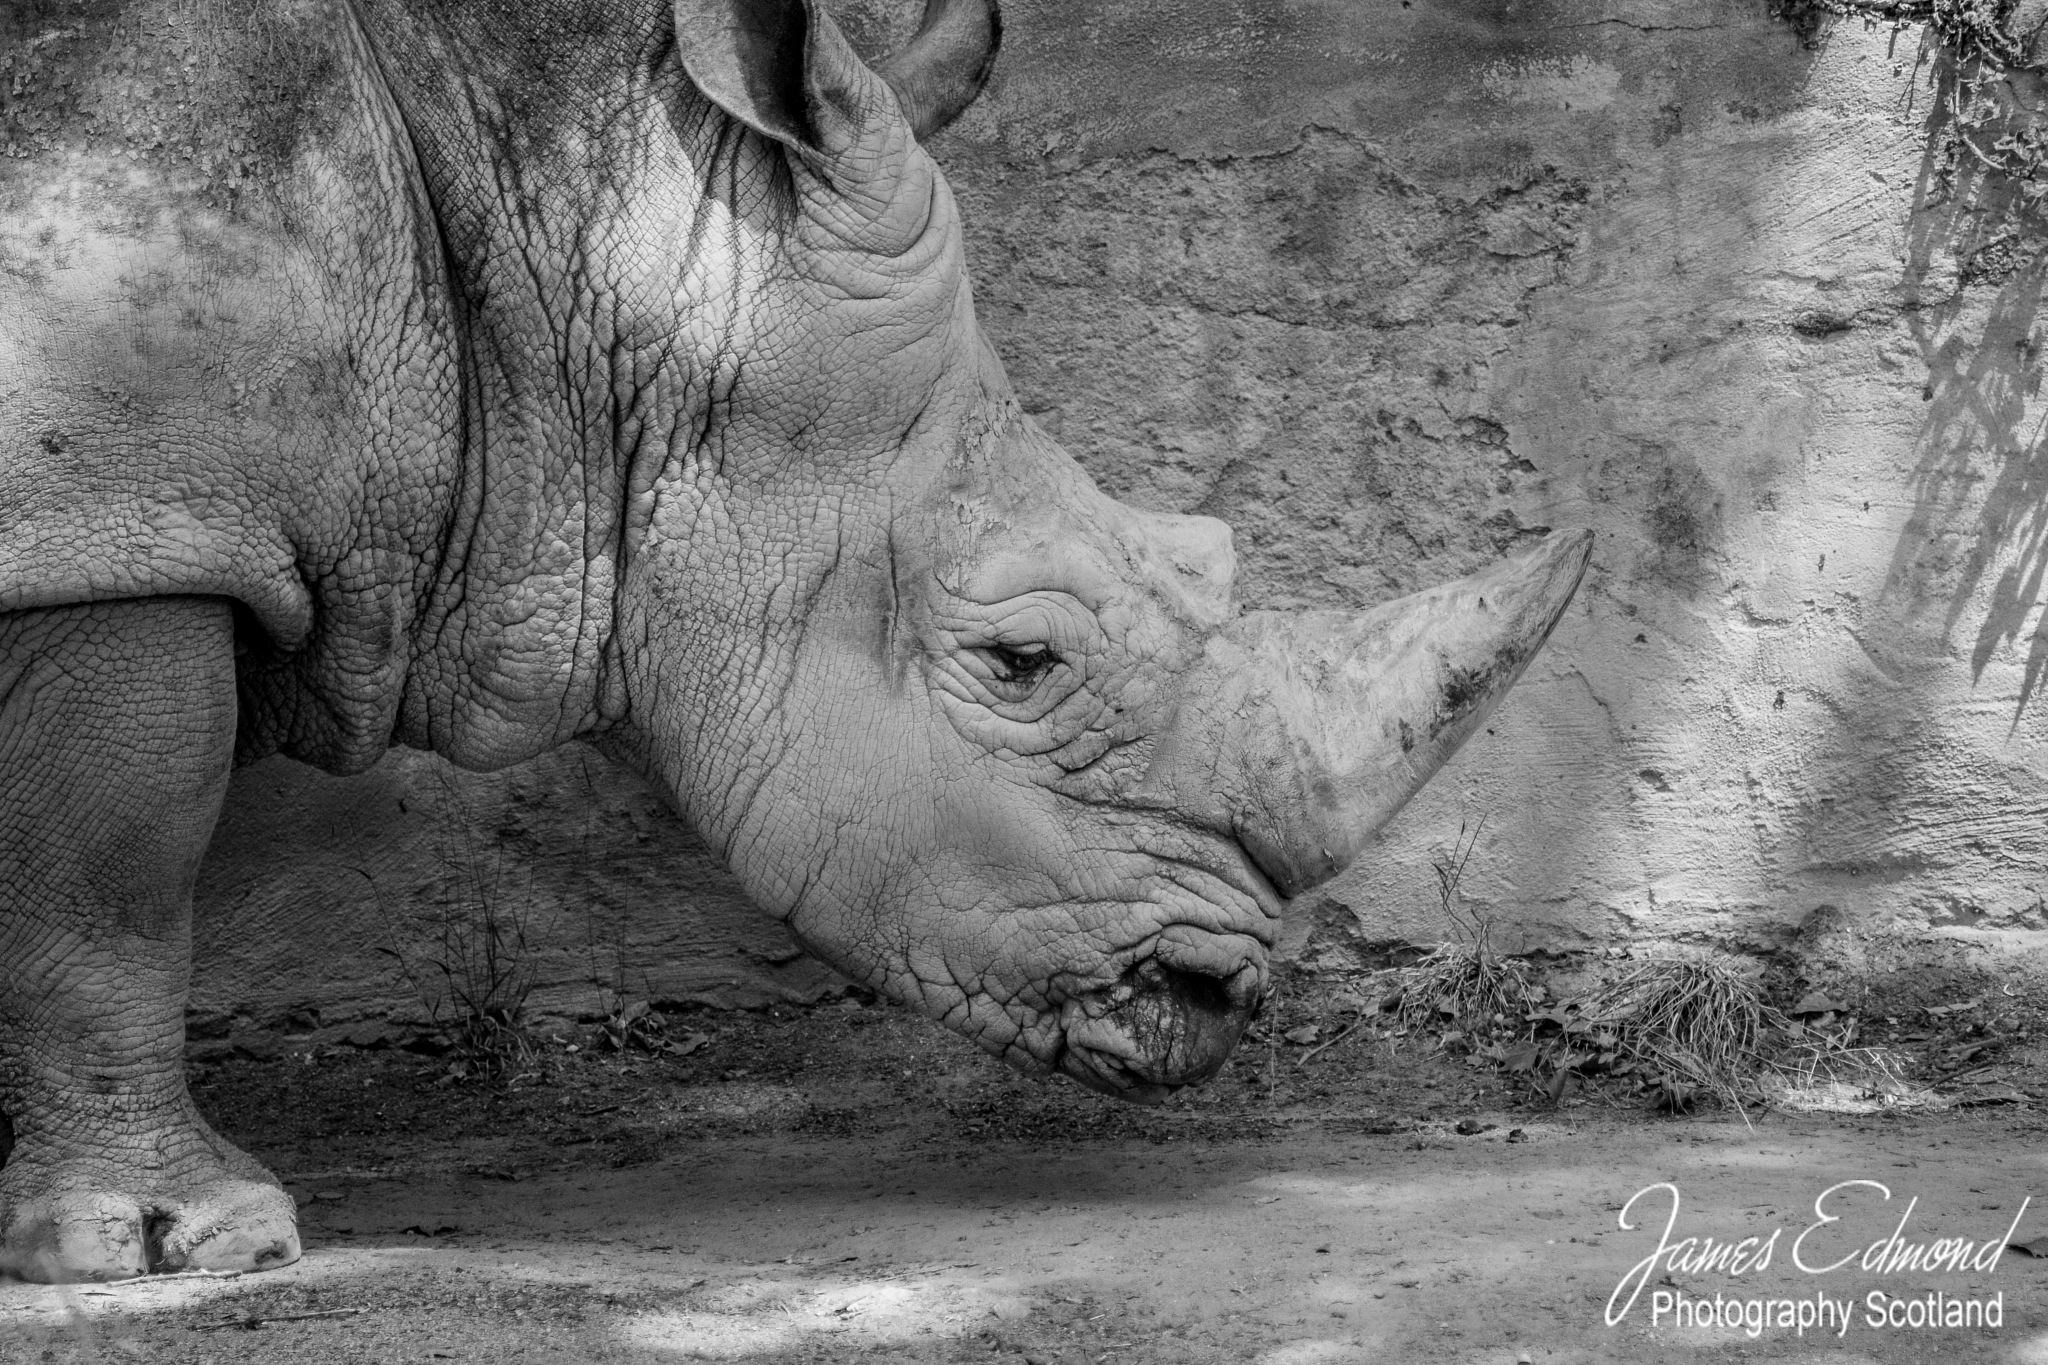 White Rhinoceros by James Edmond Photography